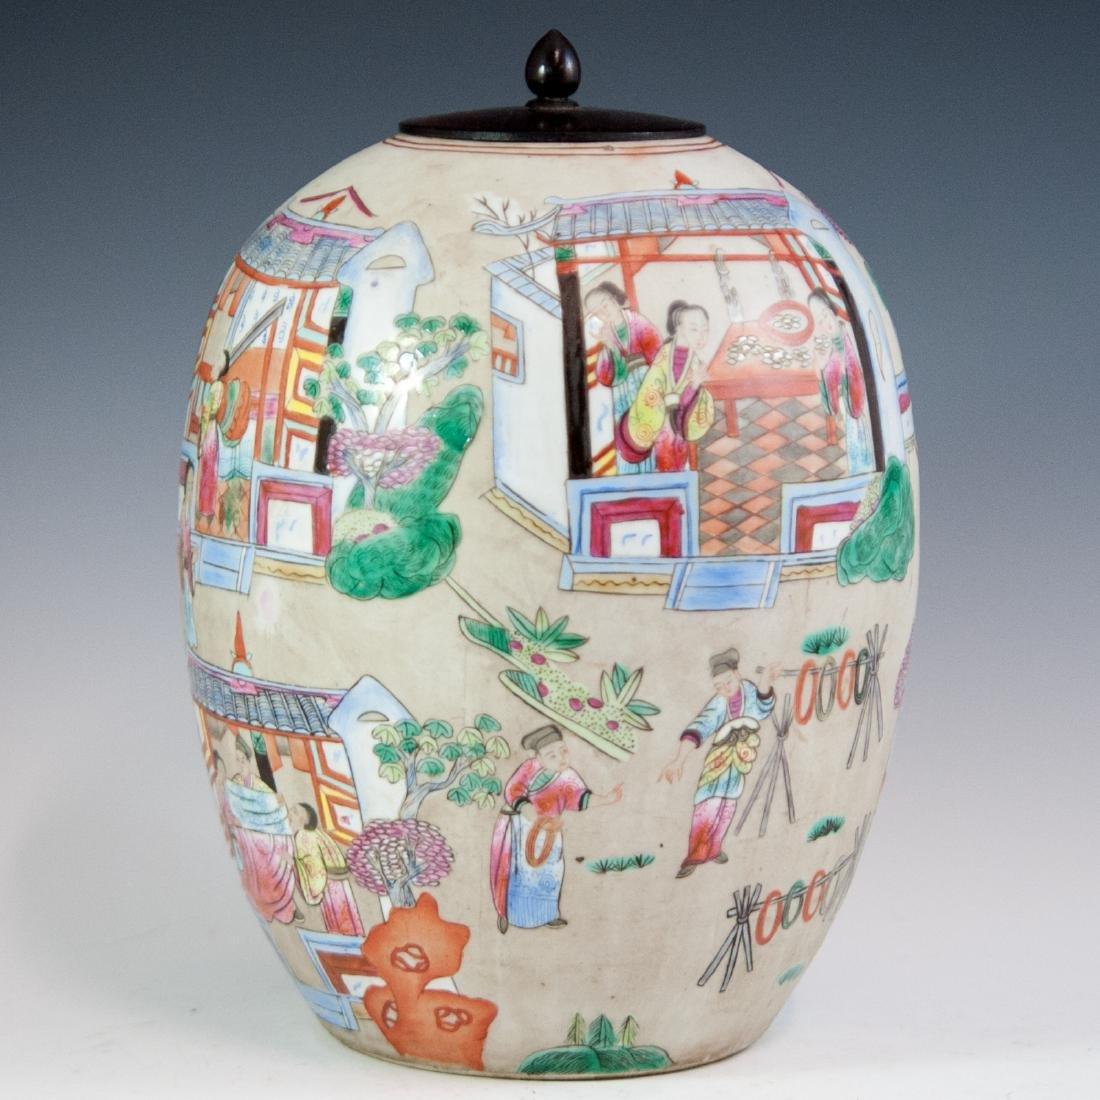 Antique Chinese Porcelain Famille Rose Jar - 2